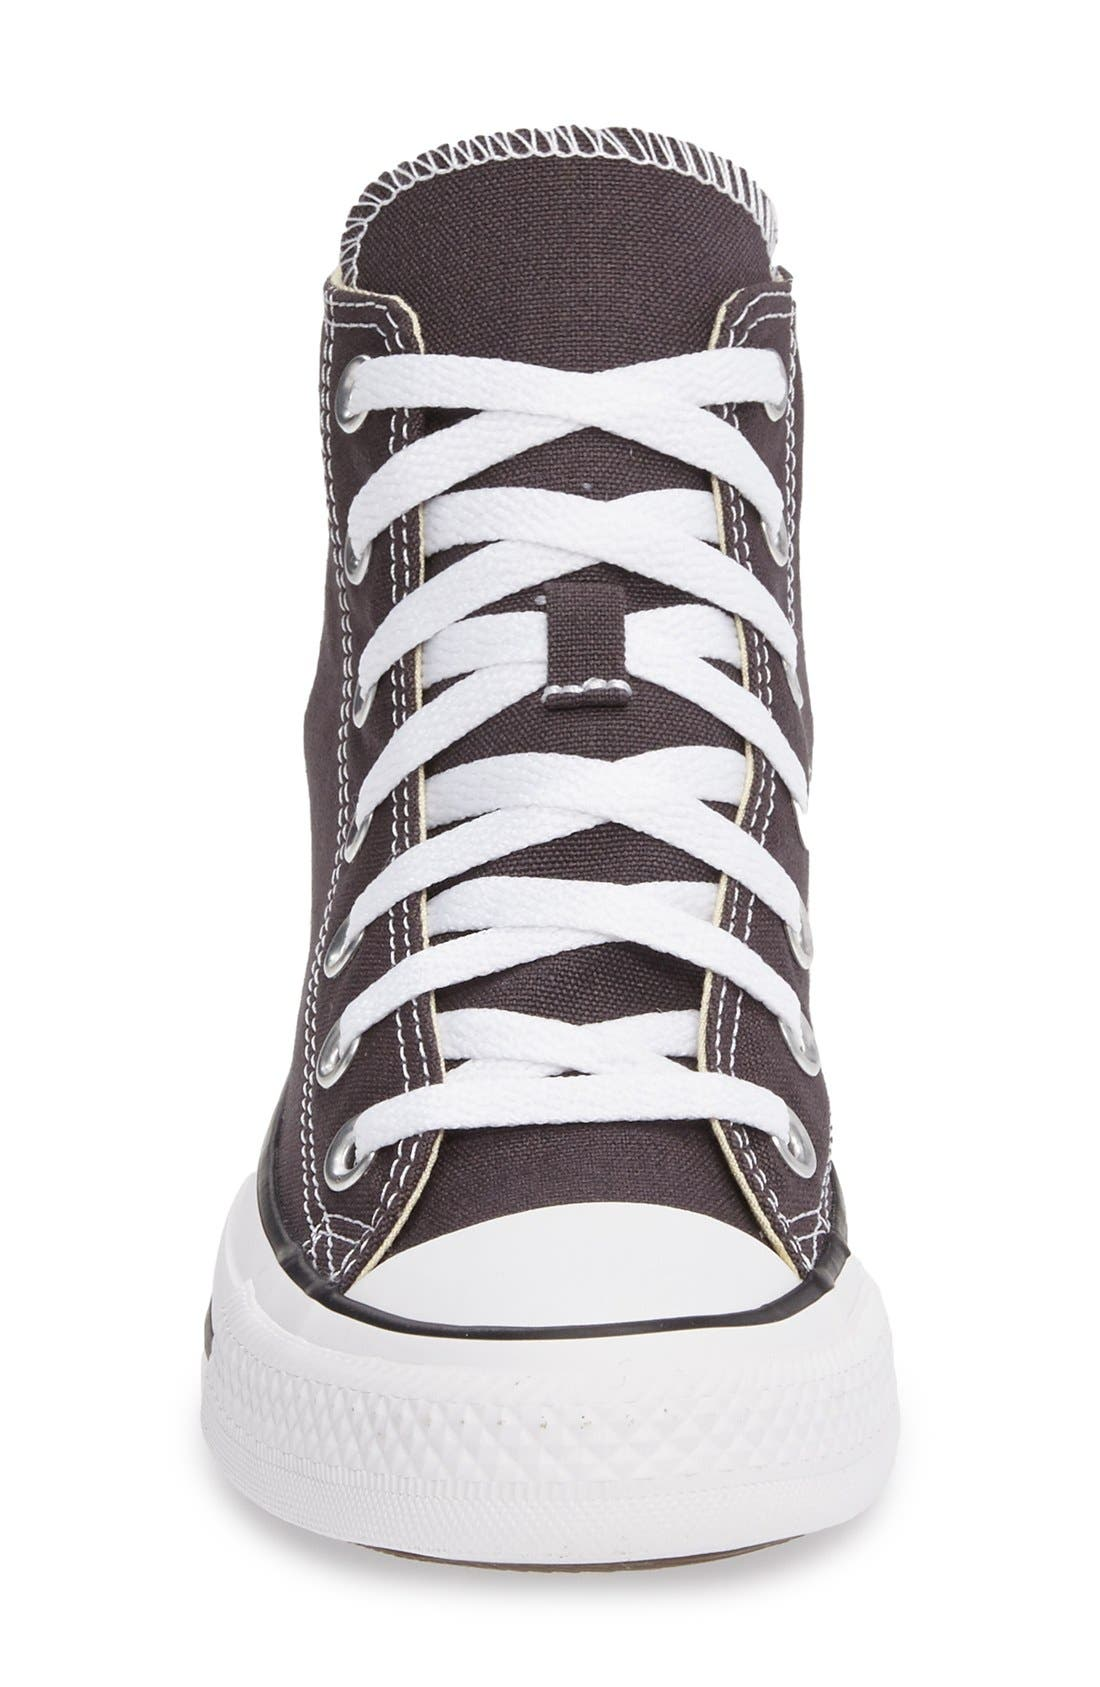 Alternate Image 3  - Converse Chuck Taylor® All Star® Seasonal High Top Sneaker (Women)